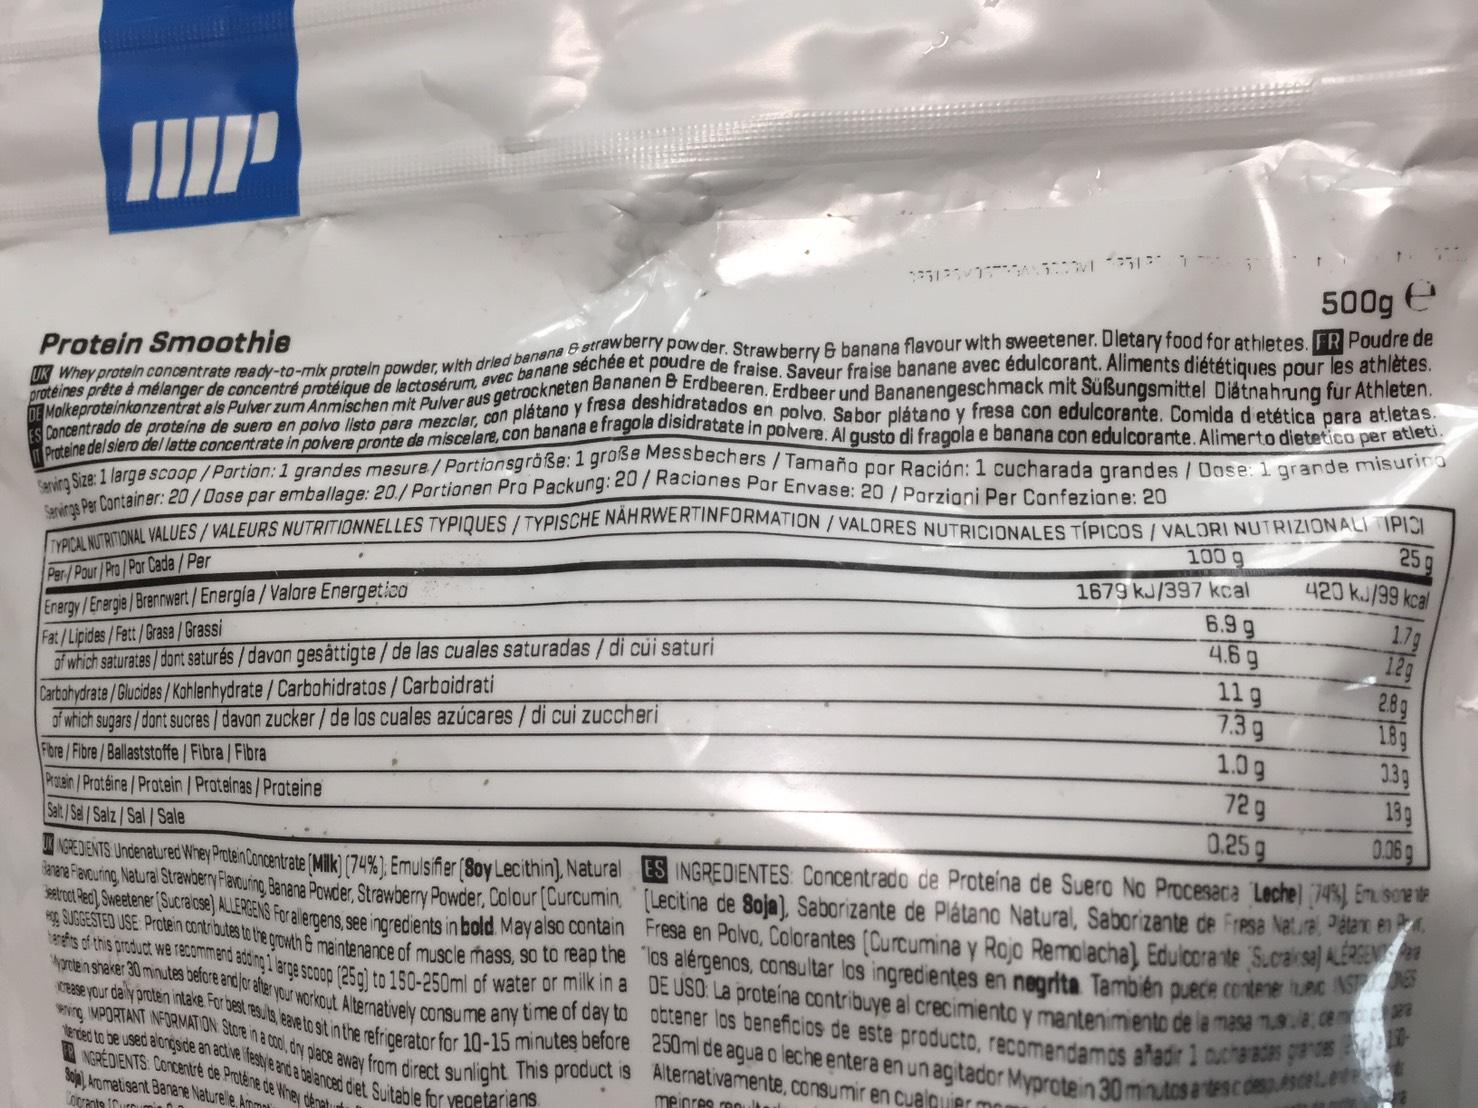 Protein Smoothie(プロテイン・スムージー)「STRAWBERRY & BANANA FLAVOUR(ストロベリー&バナナ味)」の成分表